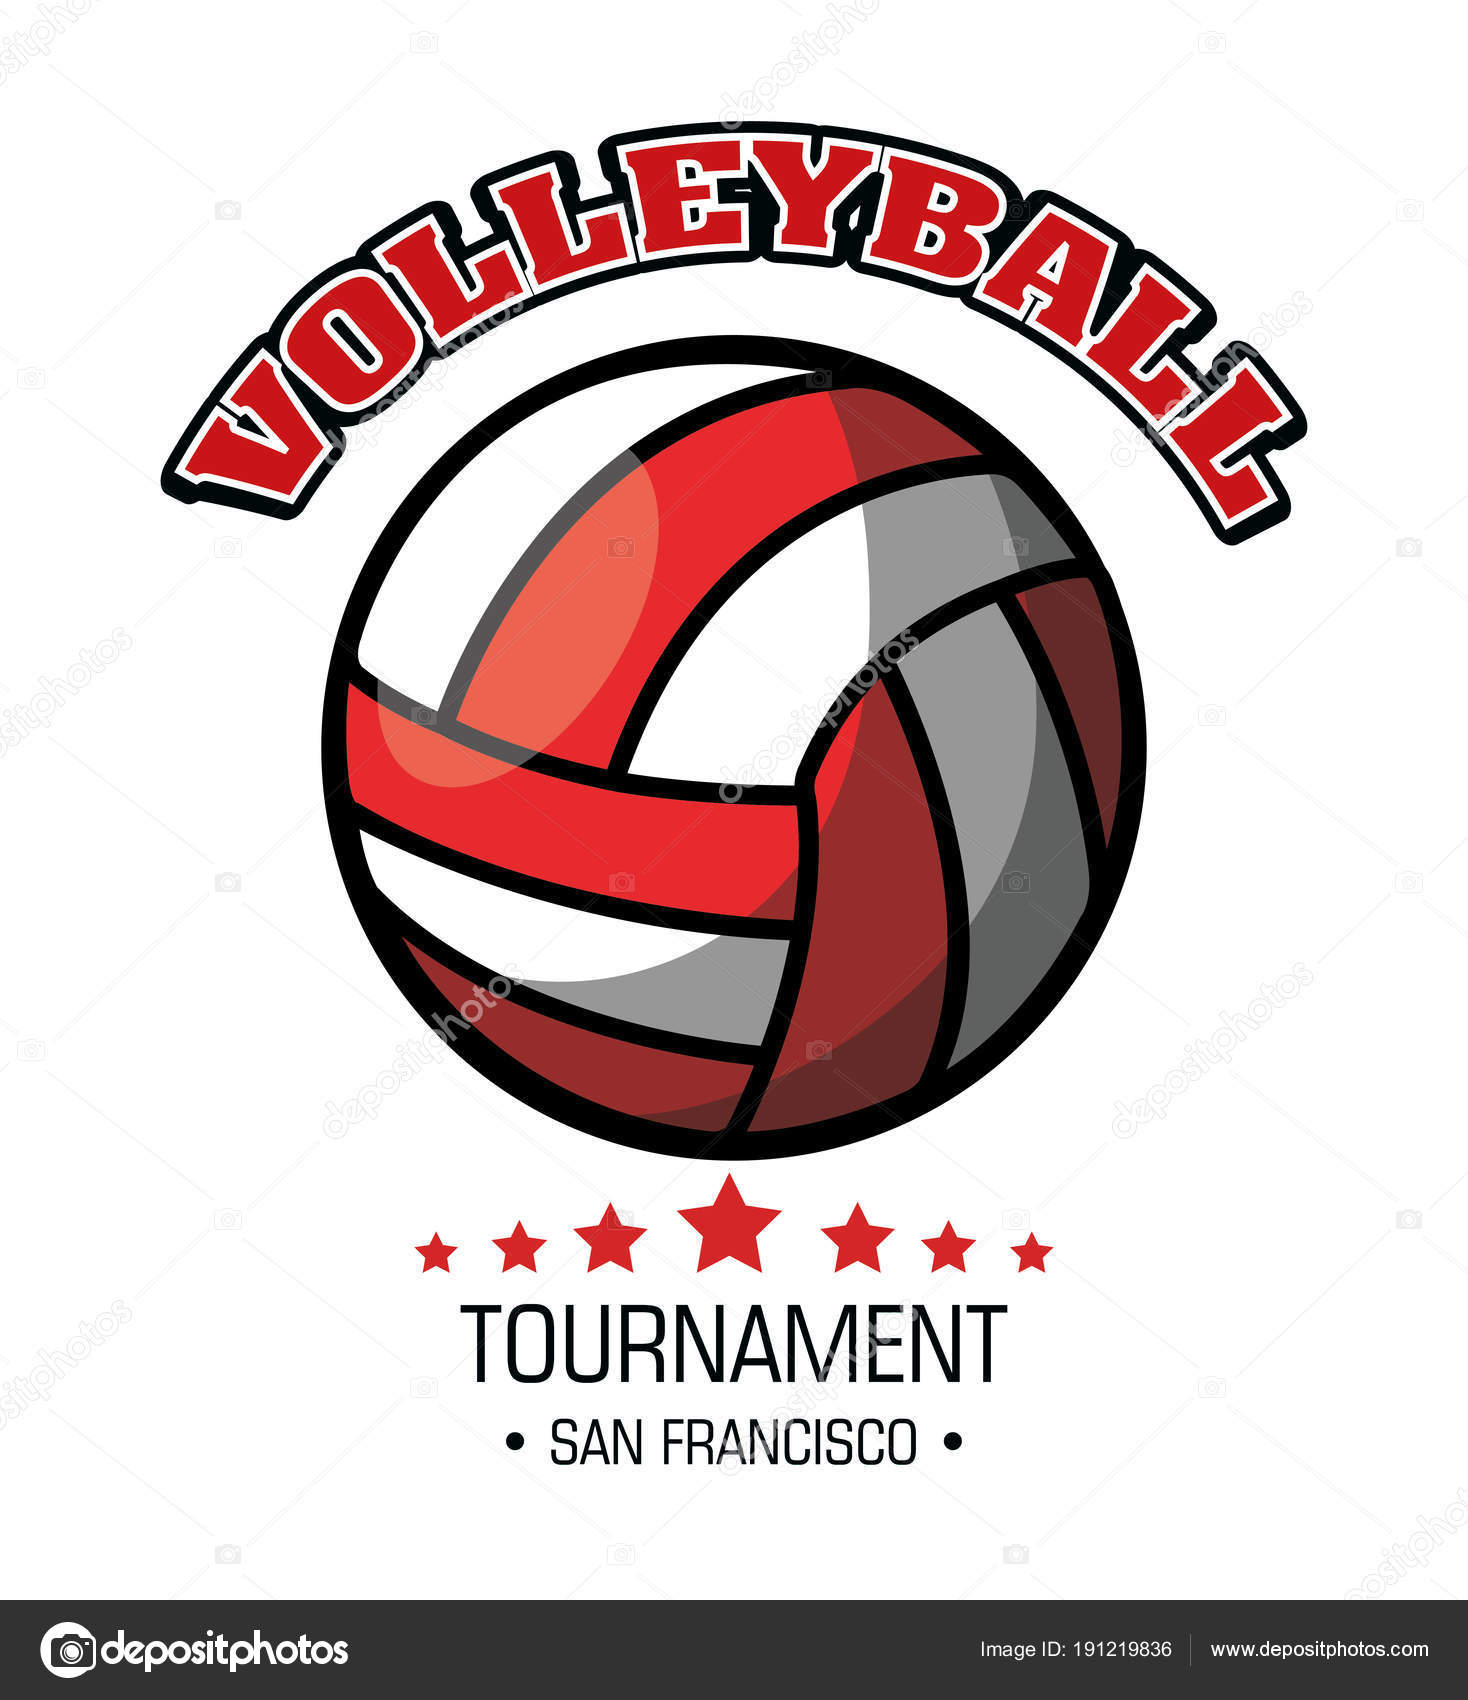 Fotos Voley Con Frases Emblema De Bola De Deporte De Voleibol